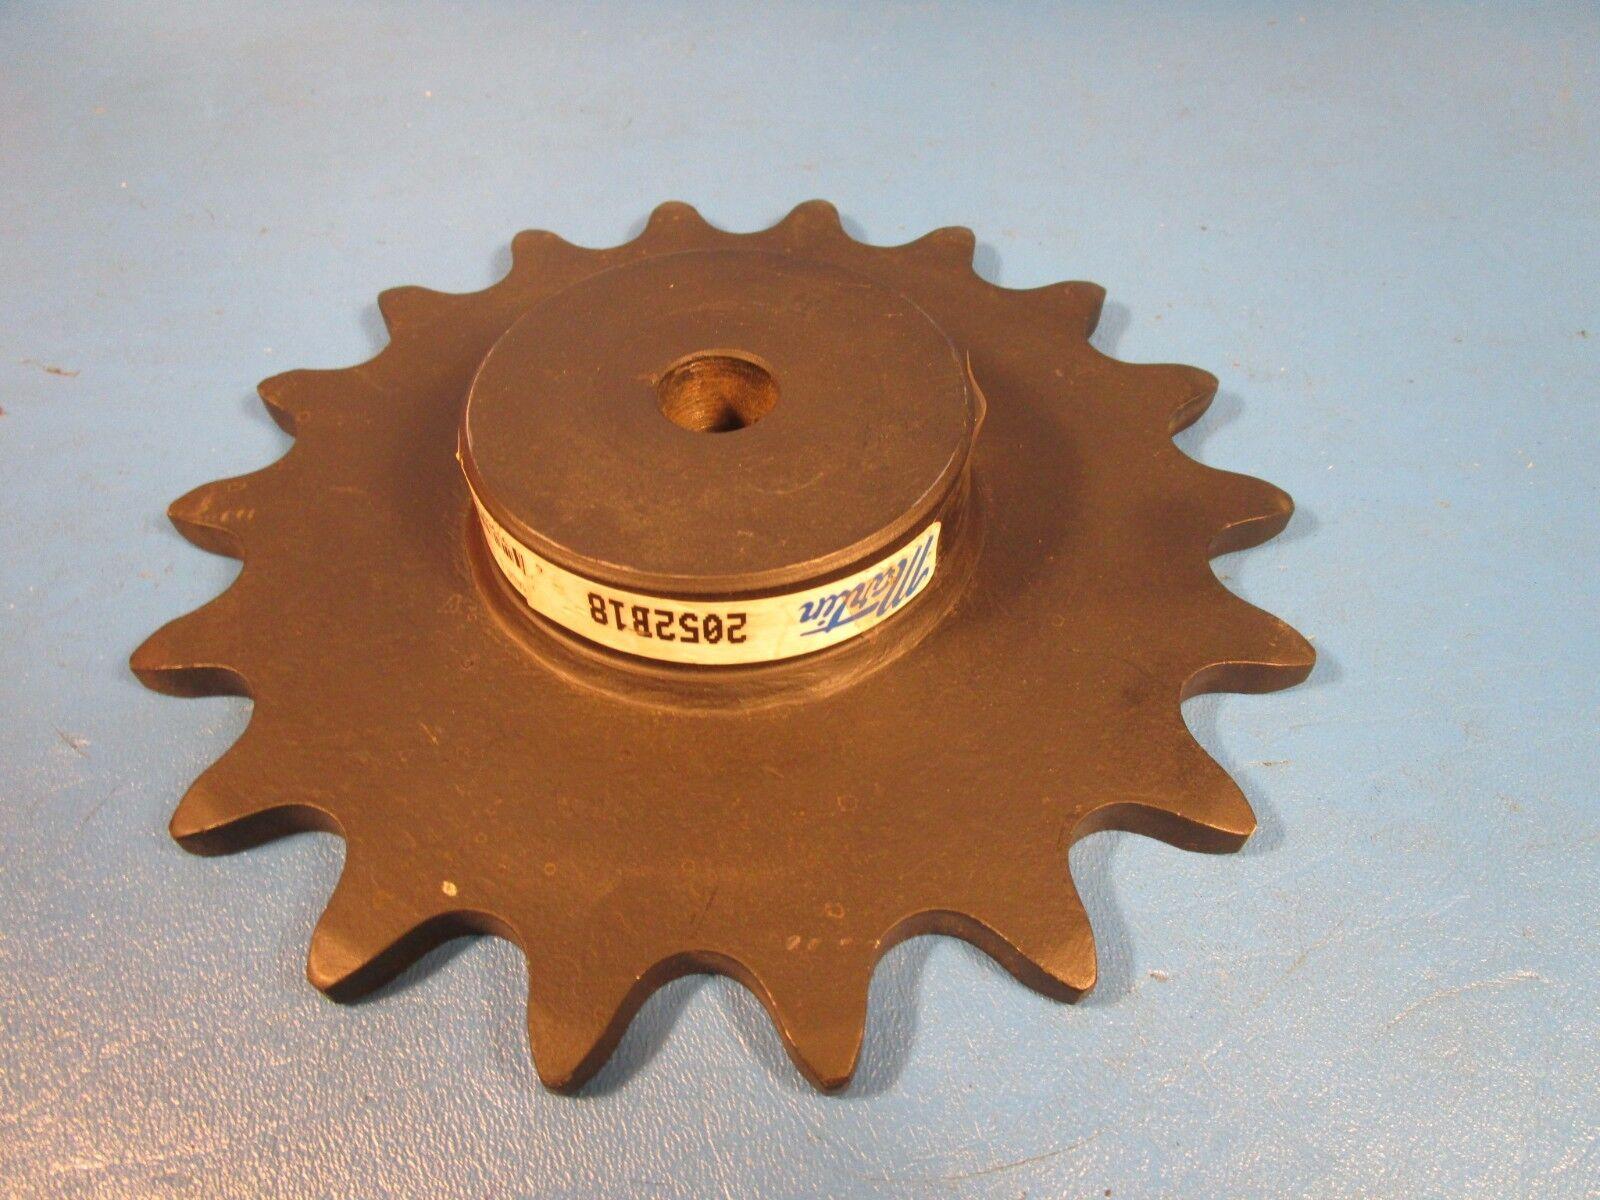 Martin 2052B18 3 4  bore, 2052 Chain,18 Teeth, 2052B18 (UST,Tsubaki )